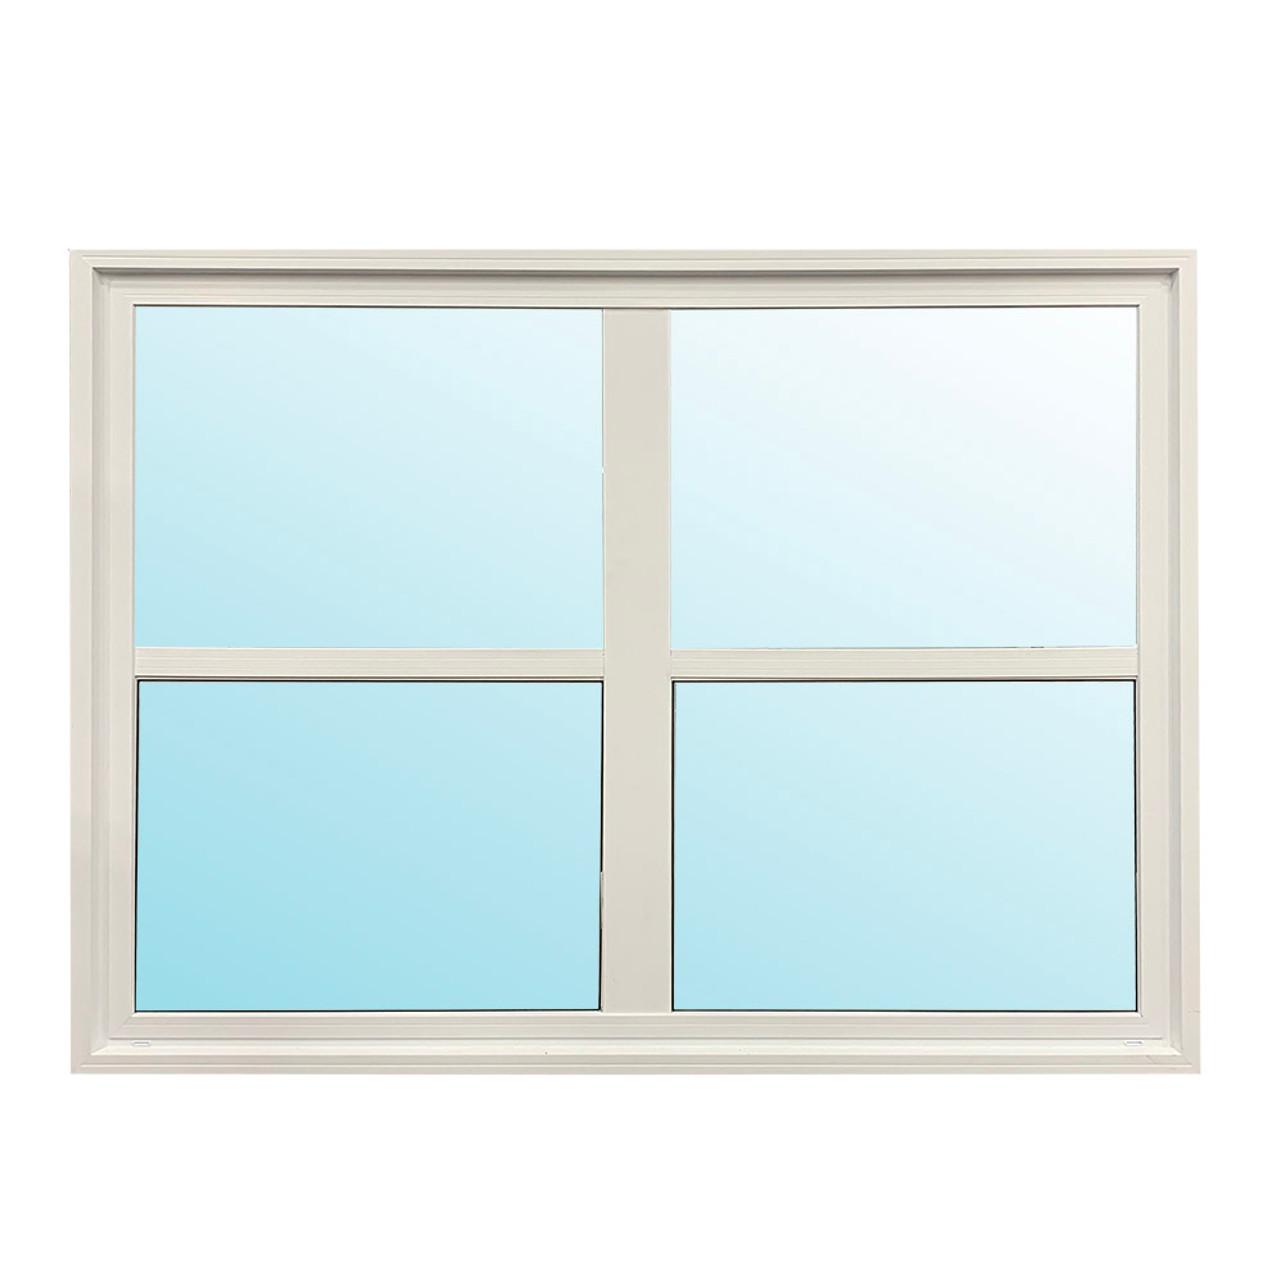 "Castlegard   60"" x 54"" Single Hung Window   LEA"